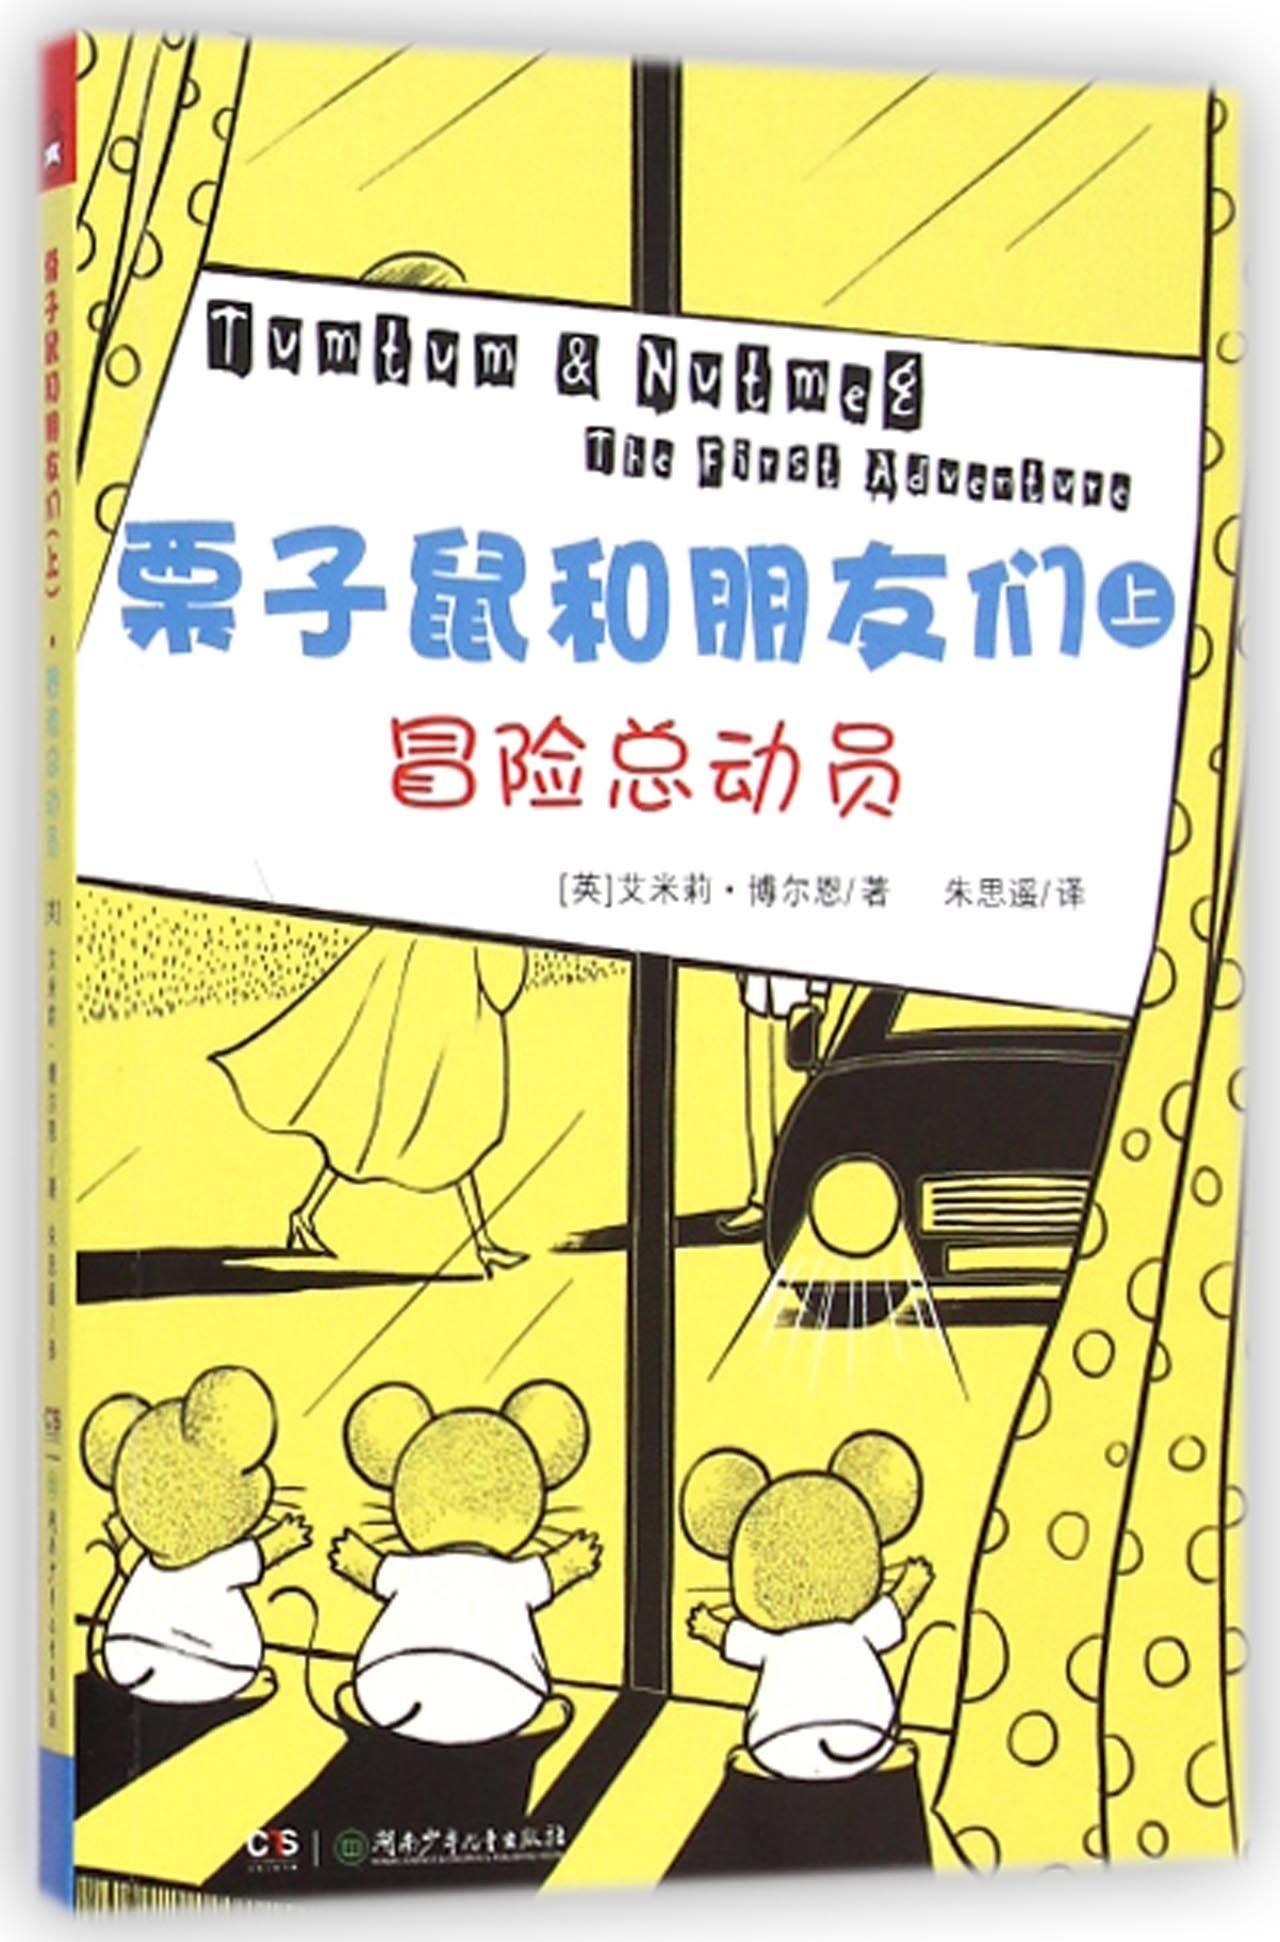 TumTum & Nutmeg The First Adventure (Chinese Edition): Emily Baulne:  9787556204953: Amazon.com: Books